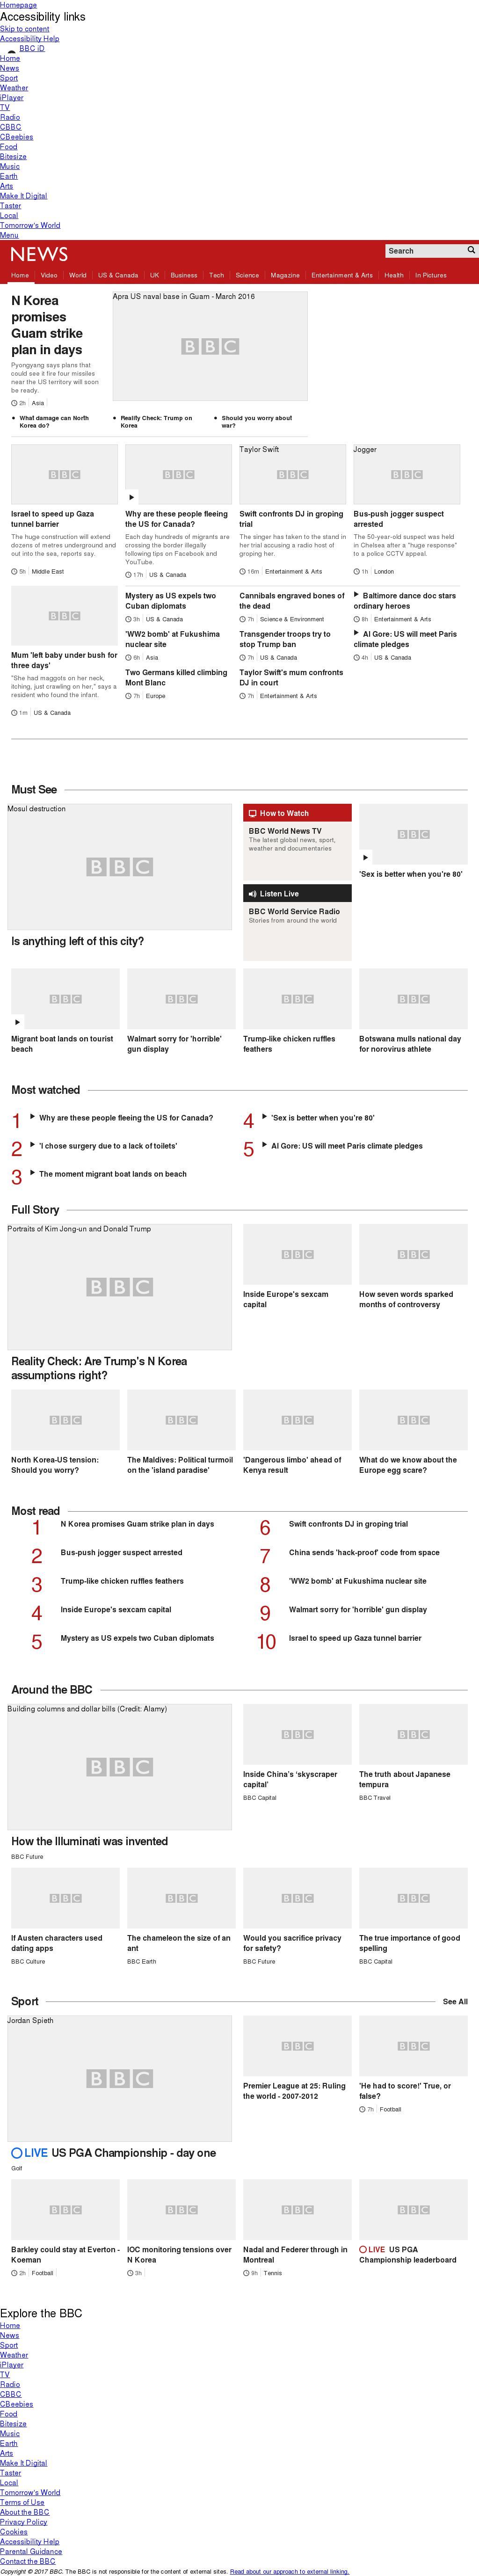 BBC at Thursday Aug. 10, 2017, 4:01 p.m. UTC